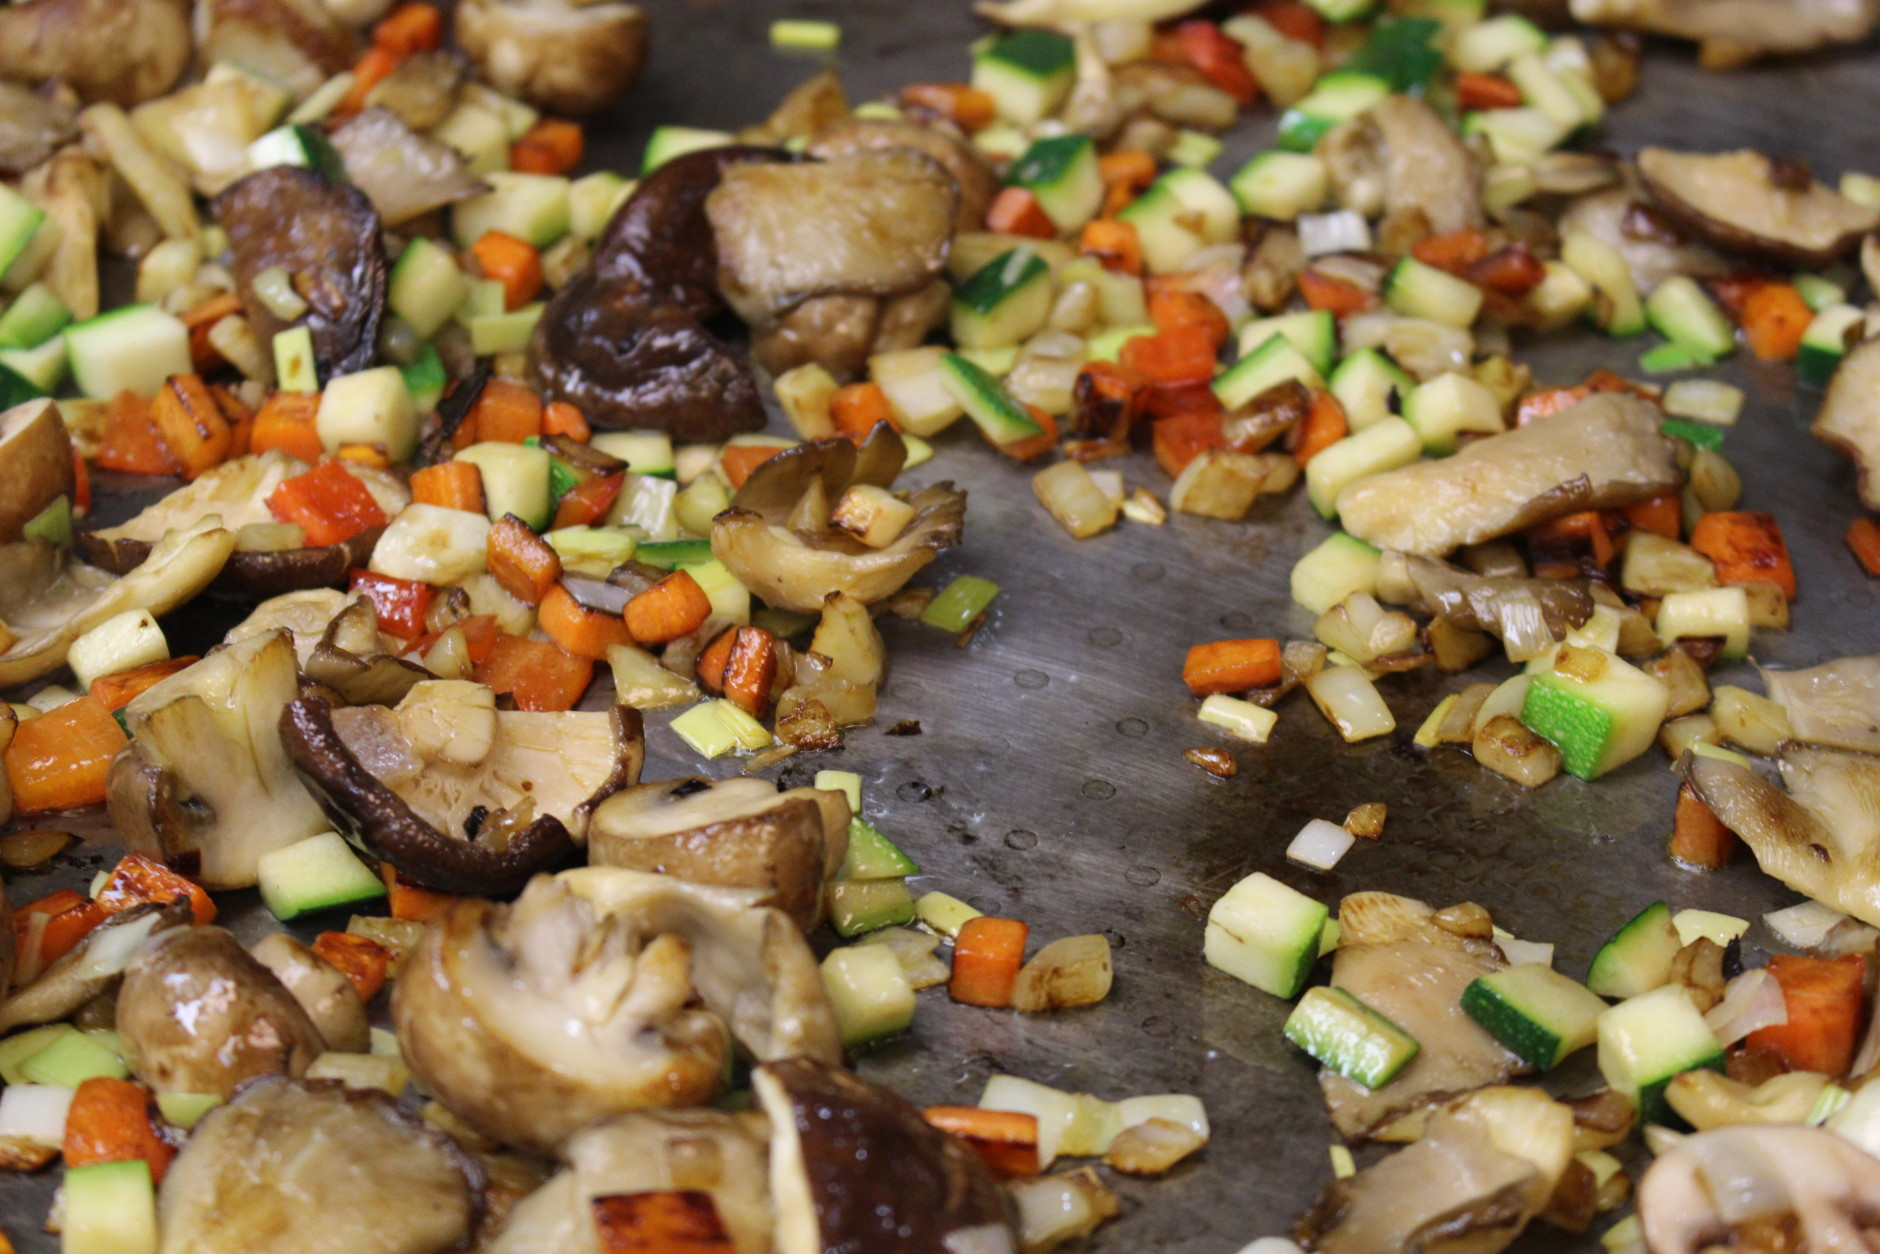 A bit of a crisp, caramelized bottom adds extra flavor. (WTOP/Dana Gooley)